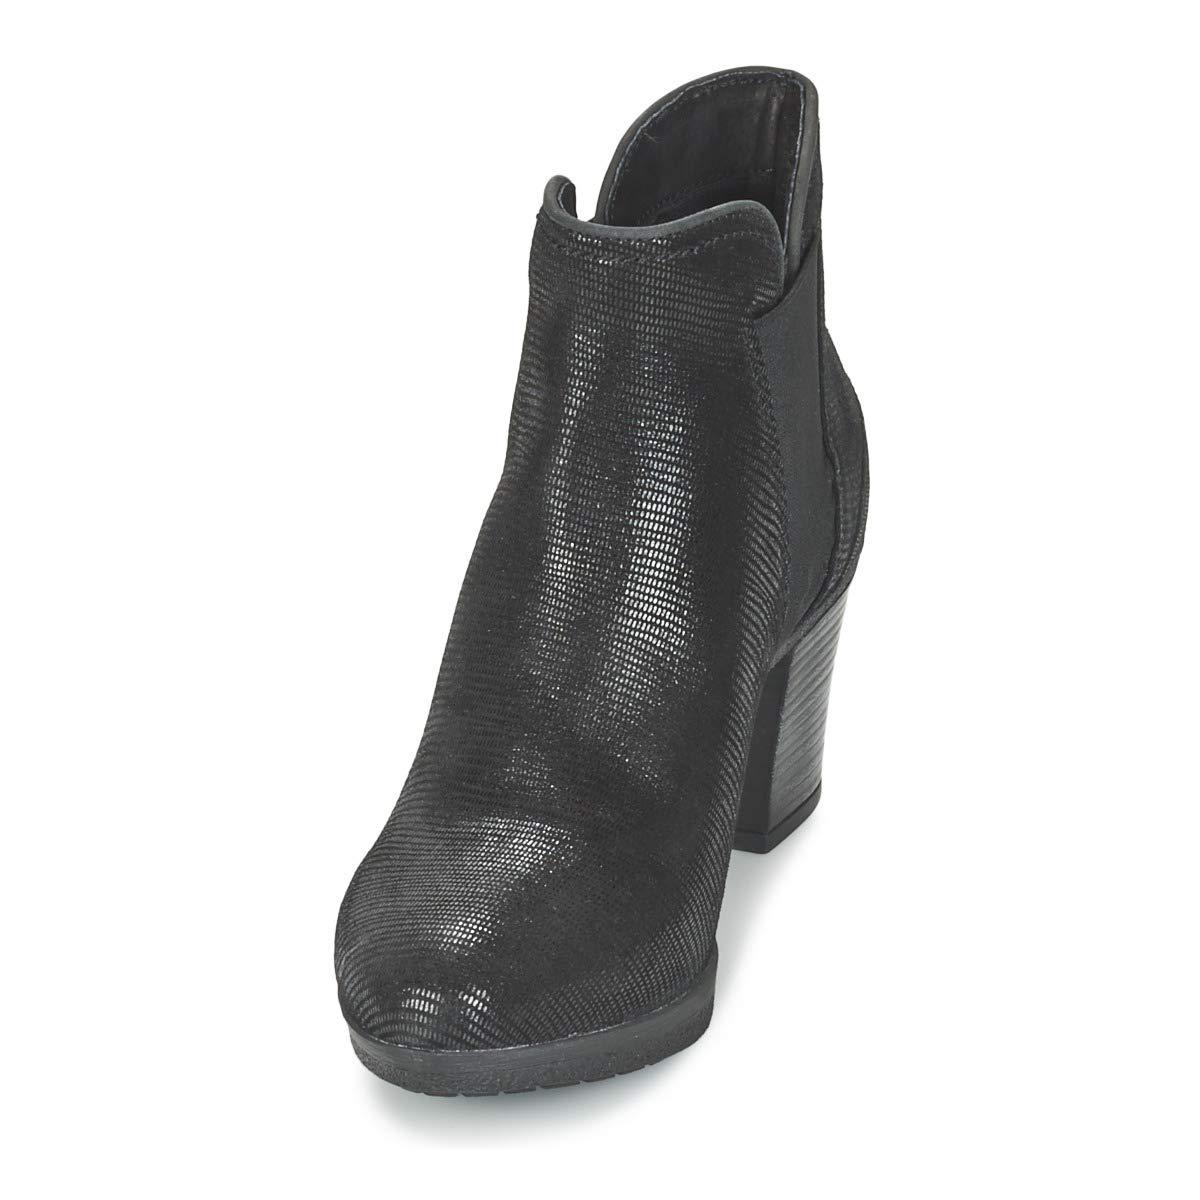 Betty London FILIOUTI Stiefelletten Stiefelletten Stiefelletten Stiefel Damen Schwarz Low Stiefel 43c9d1